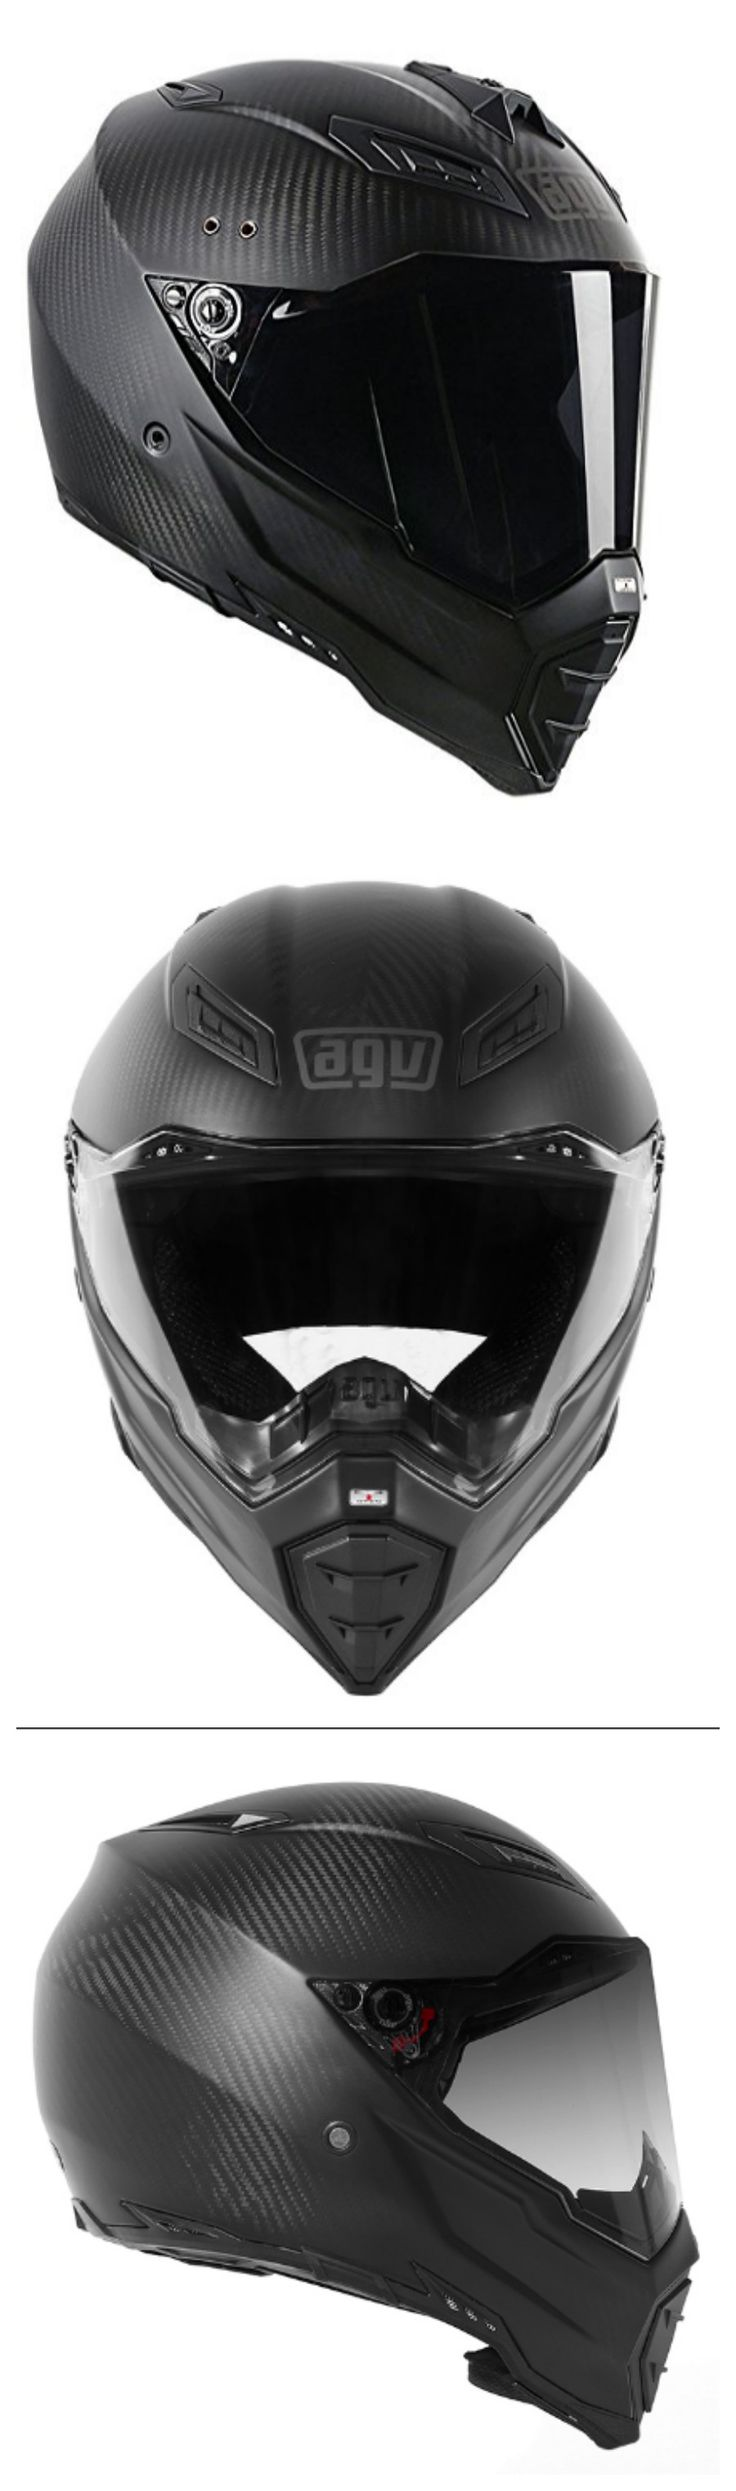 AGV AX 8 Evo Naked Road Helmets Carbon Fiber Tall